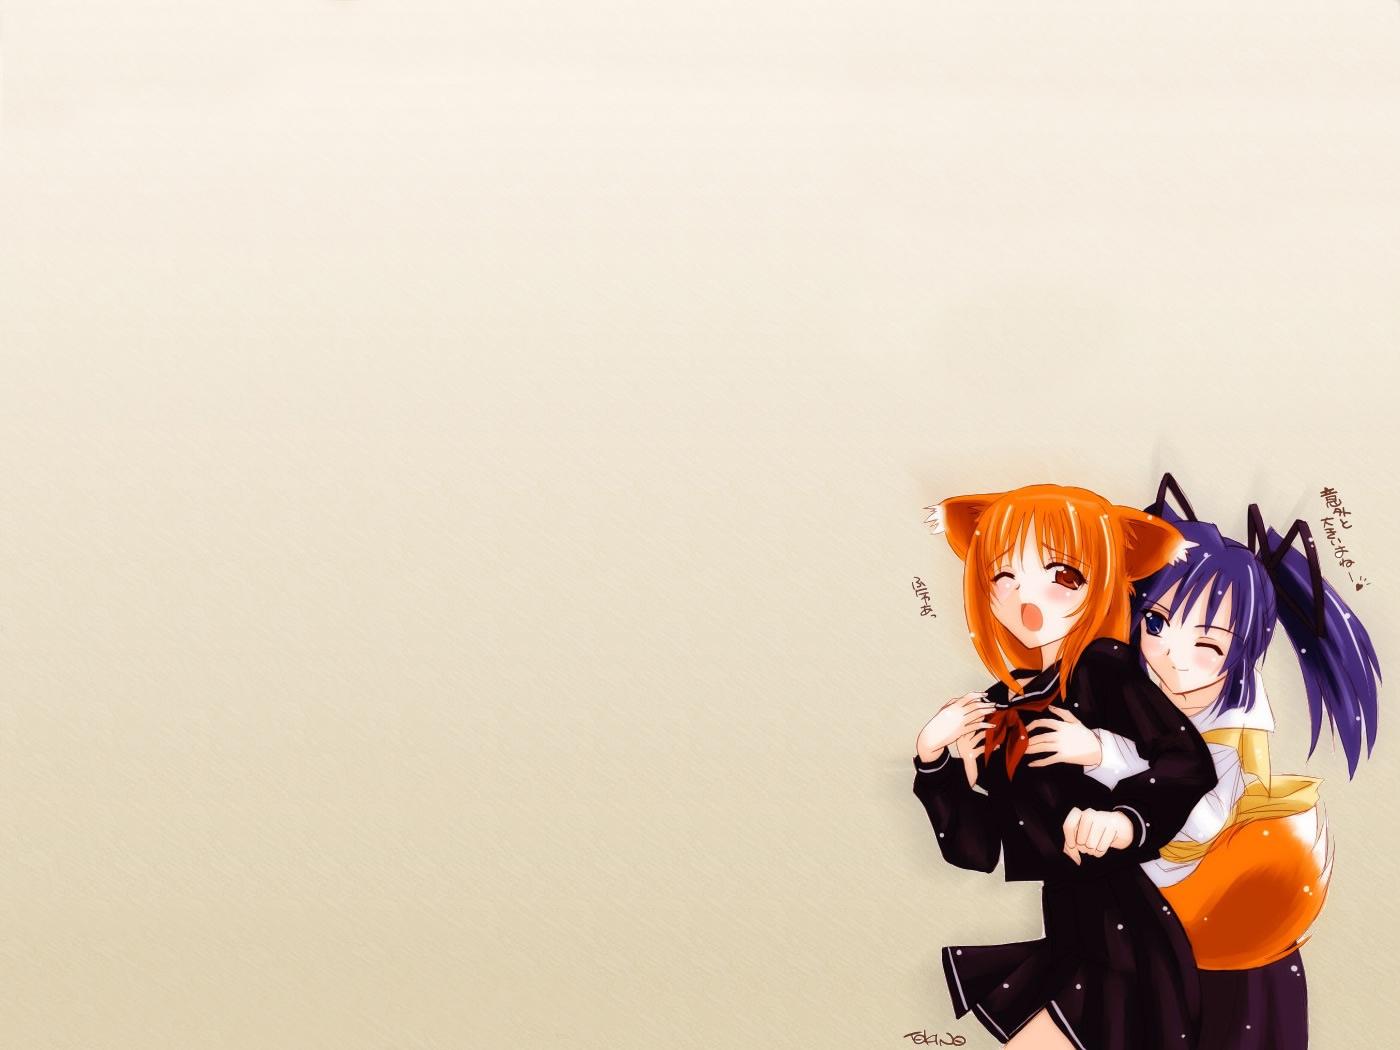 animal_ears anthropomorphism firefox foxgirl hana_(ukagaka) kuro_(ukagaka) school_uniform tokino ukagaka